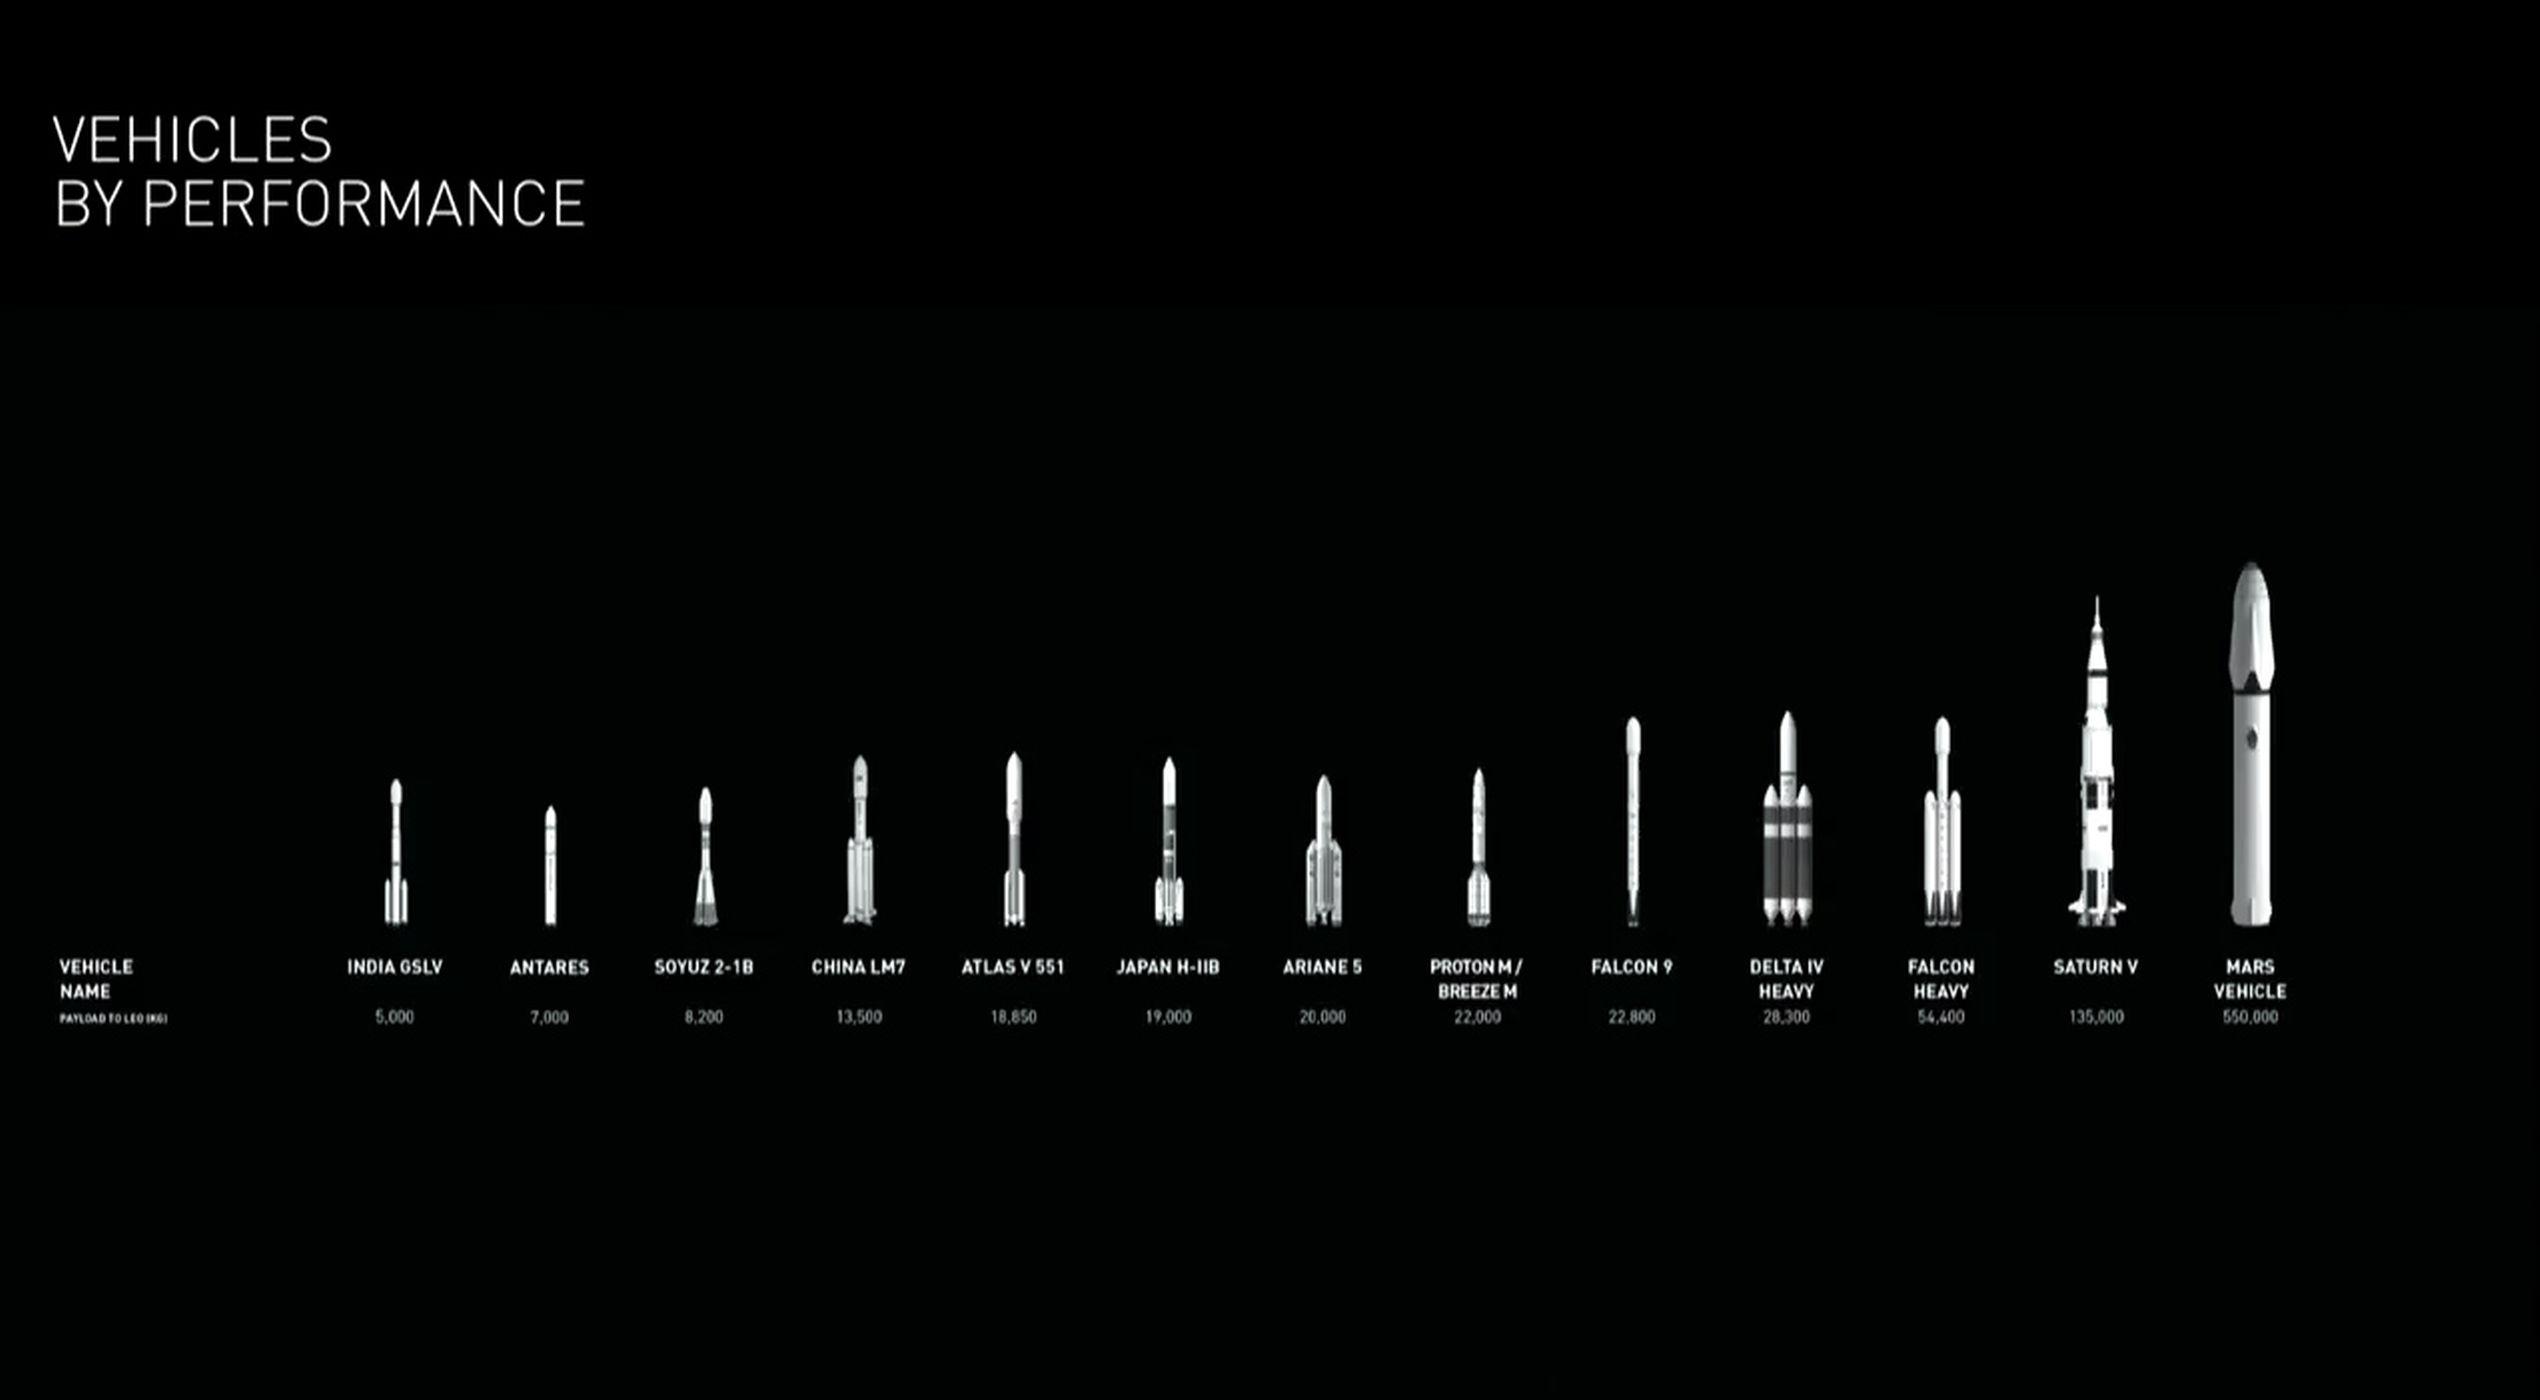 spacex-mars-its-teljesitmeny-osszehasonlitas.jpg